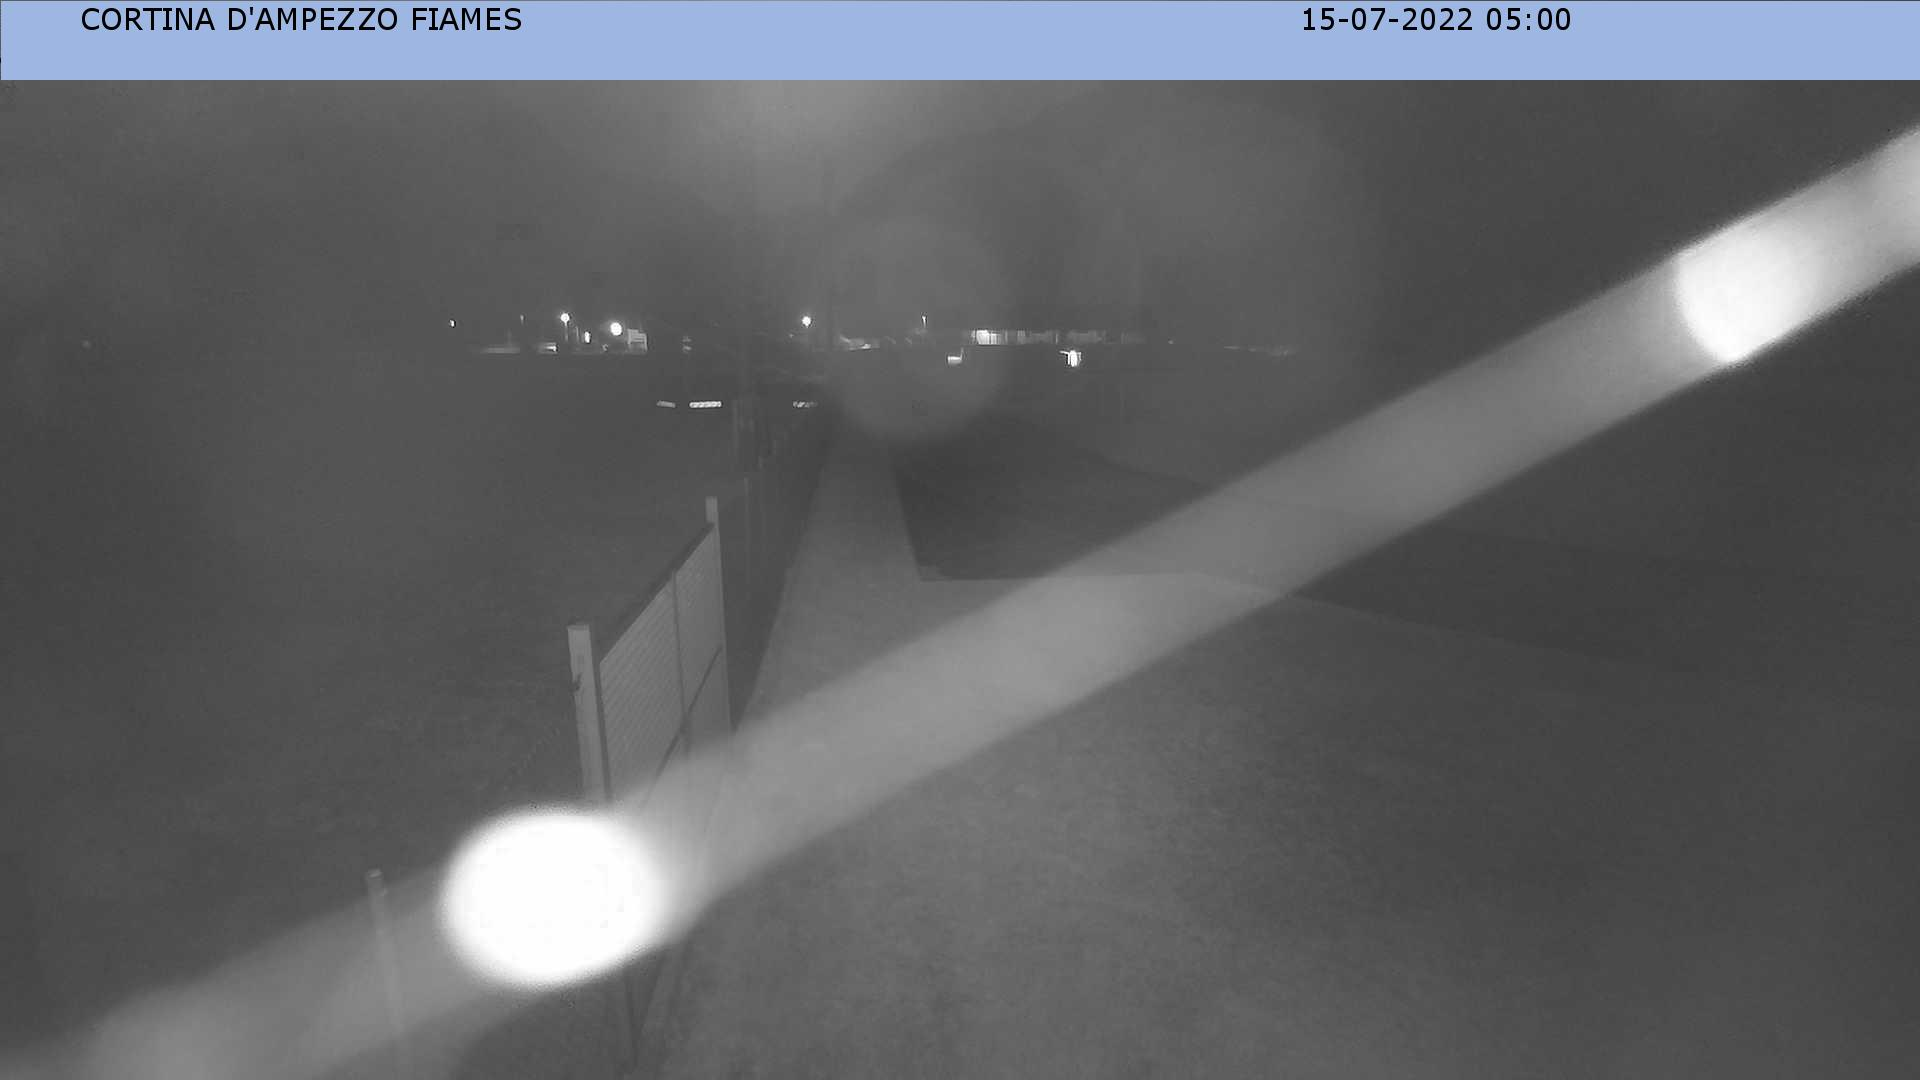 Webkamera Cortina d'Ampezzo